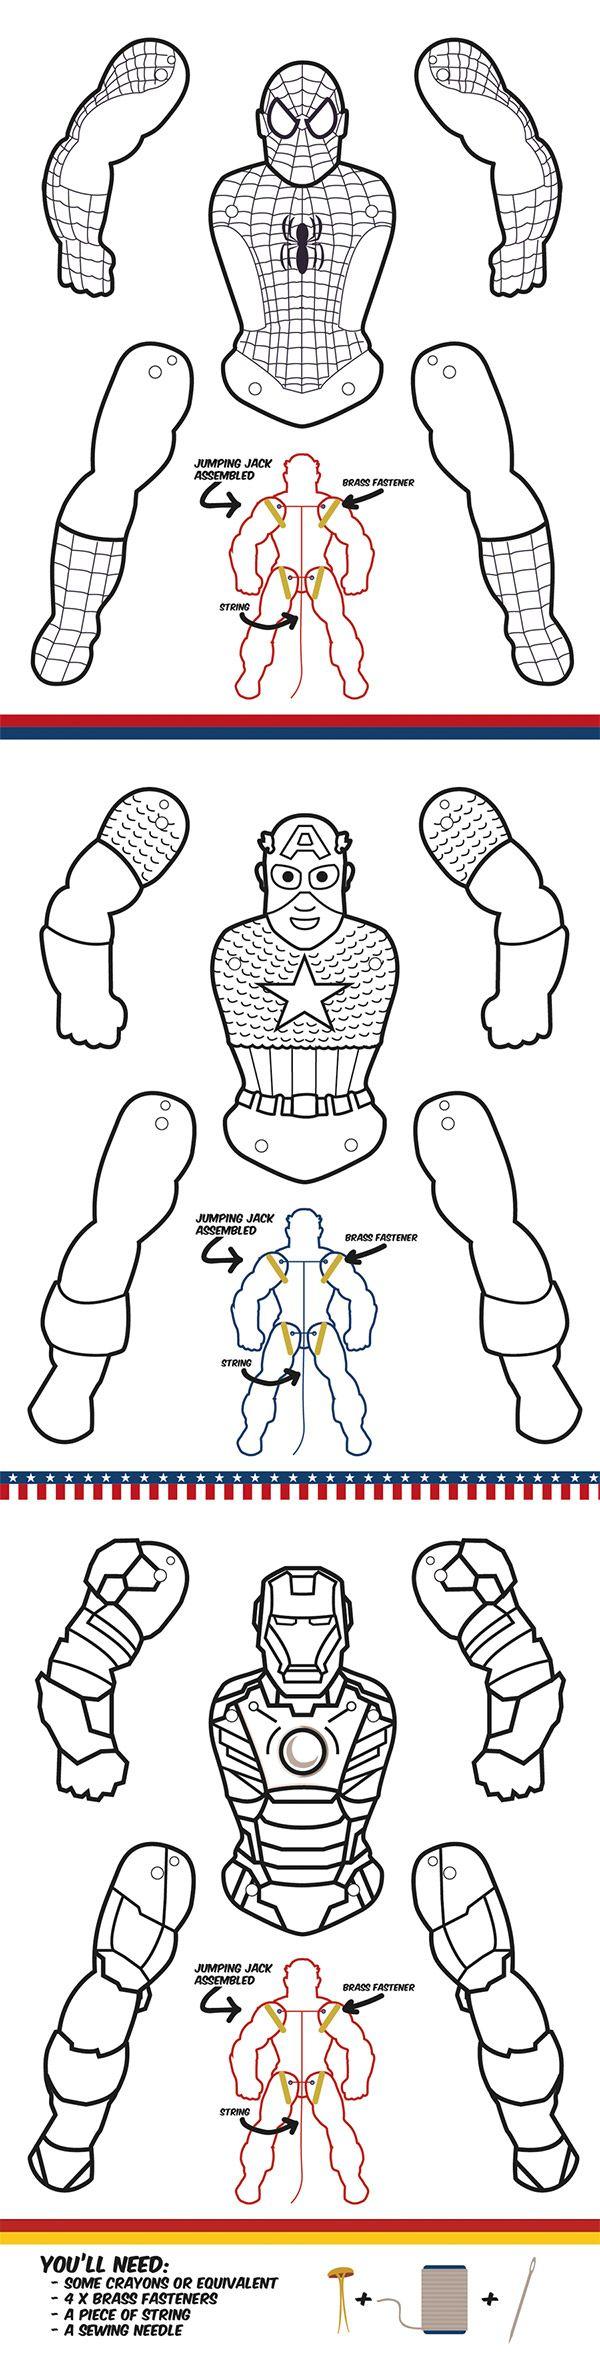 Superhero Jumping Jacks - Coloring Edition | Preschool